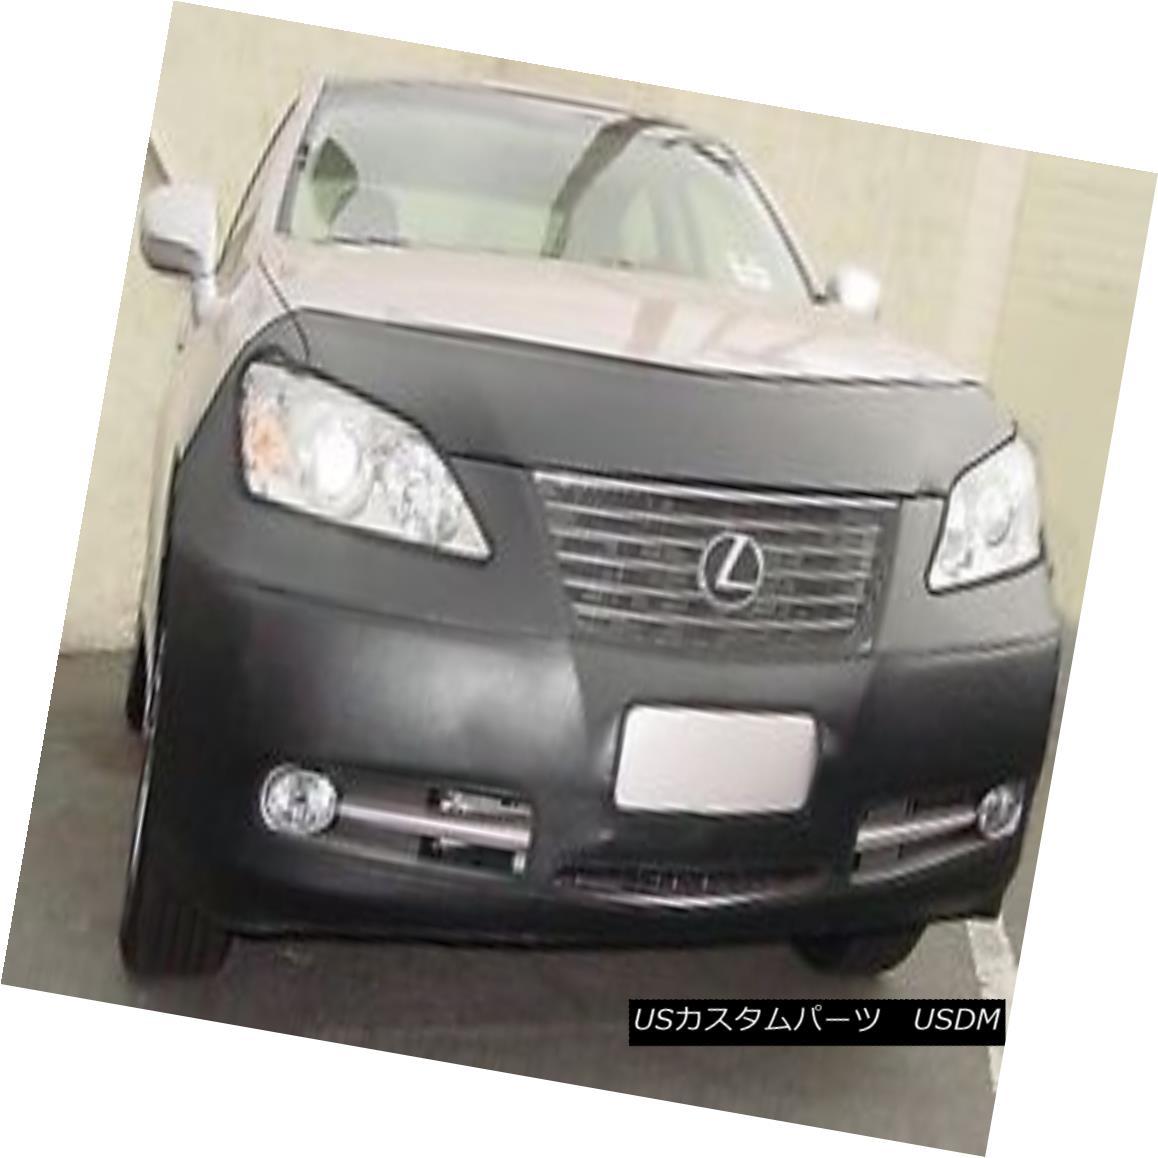 Plate,Sensors Fits Lexus ES350 2007-2009 W//O Lic Colgan Front End Mask Bra 2pc